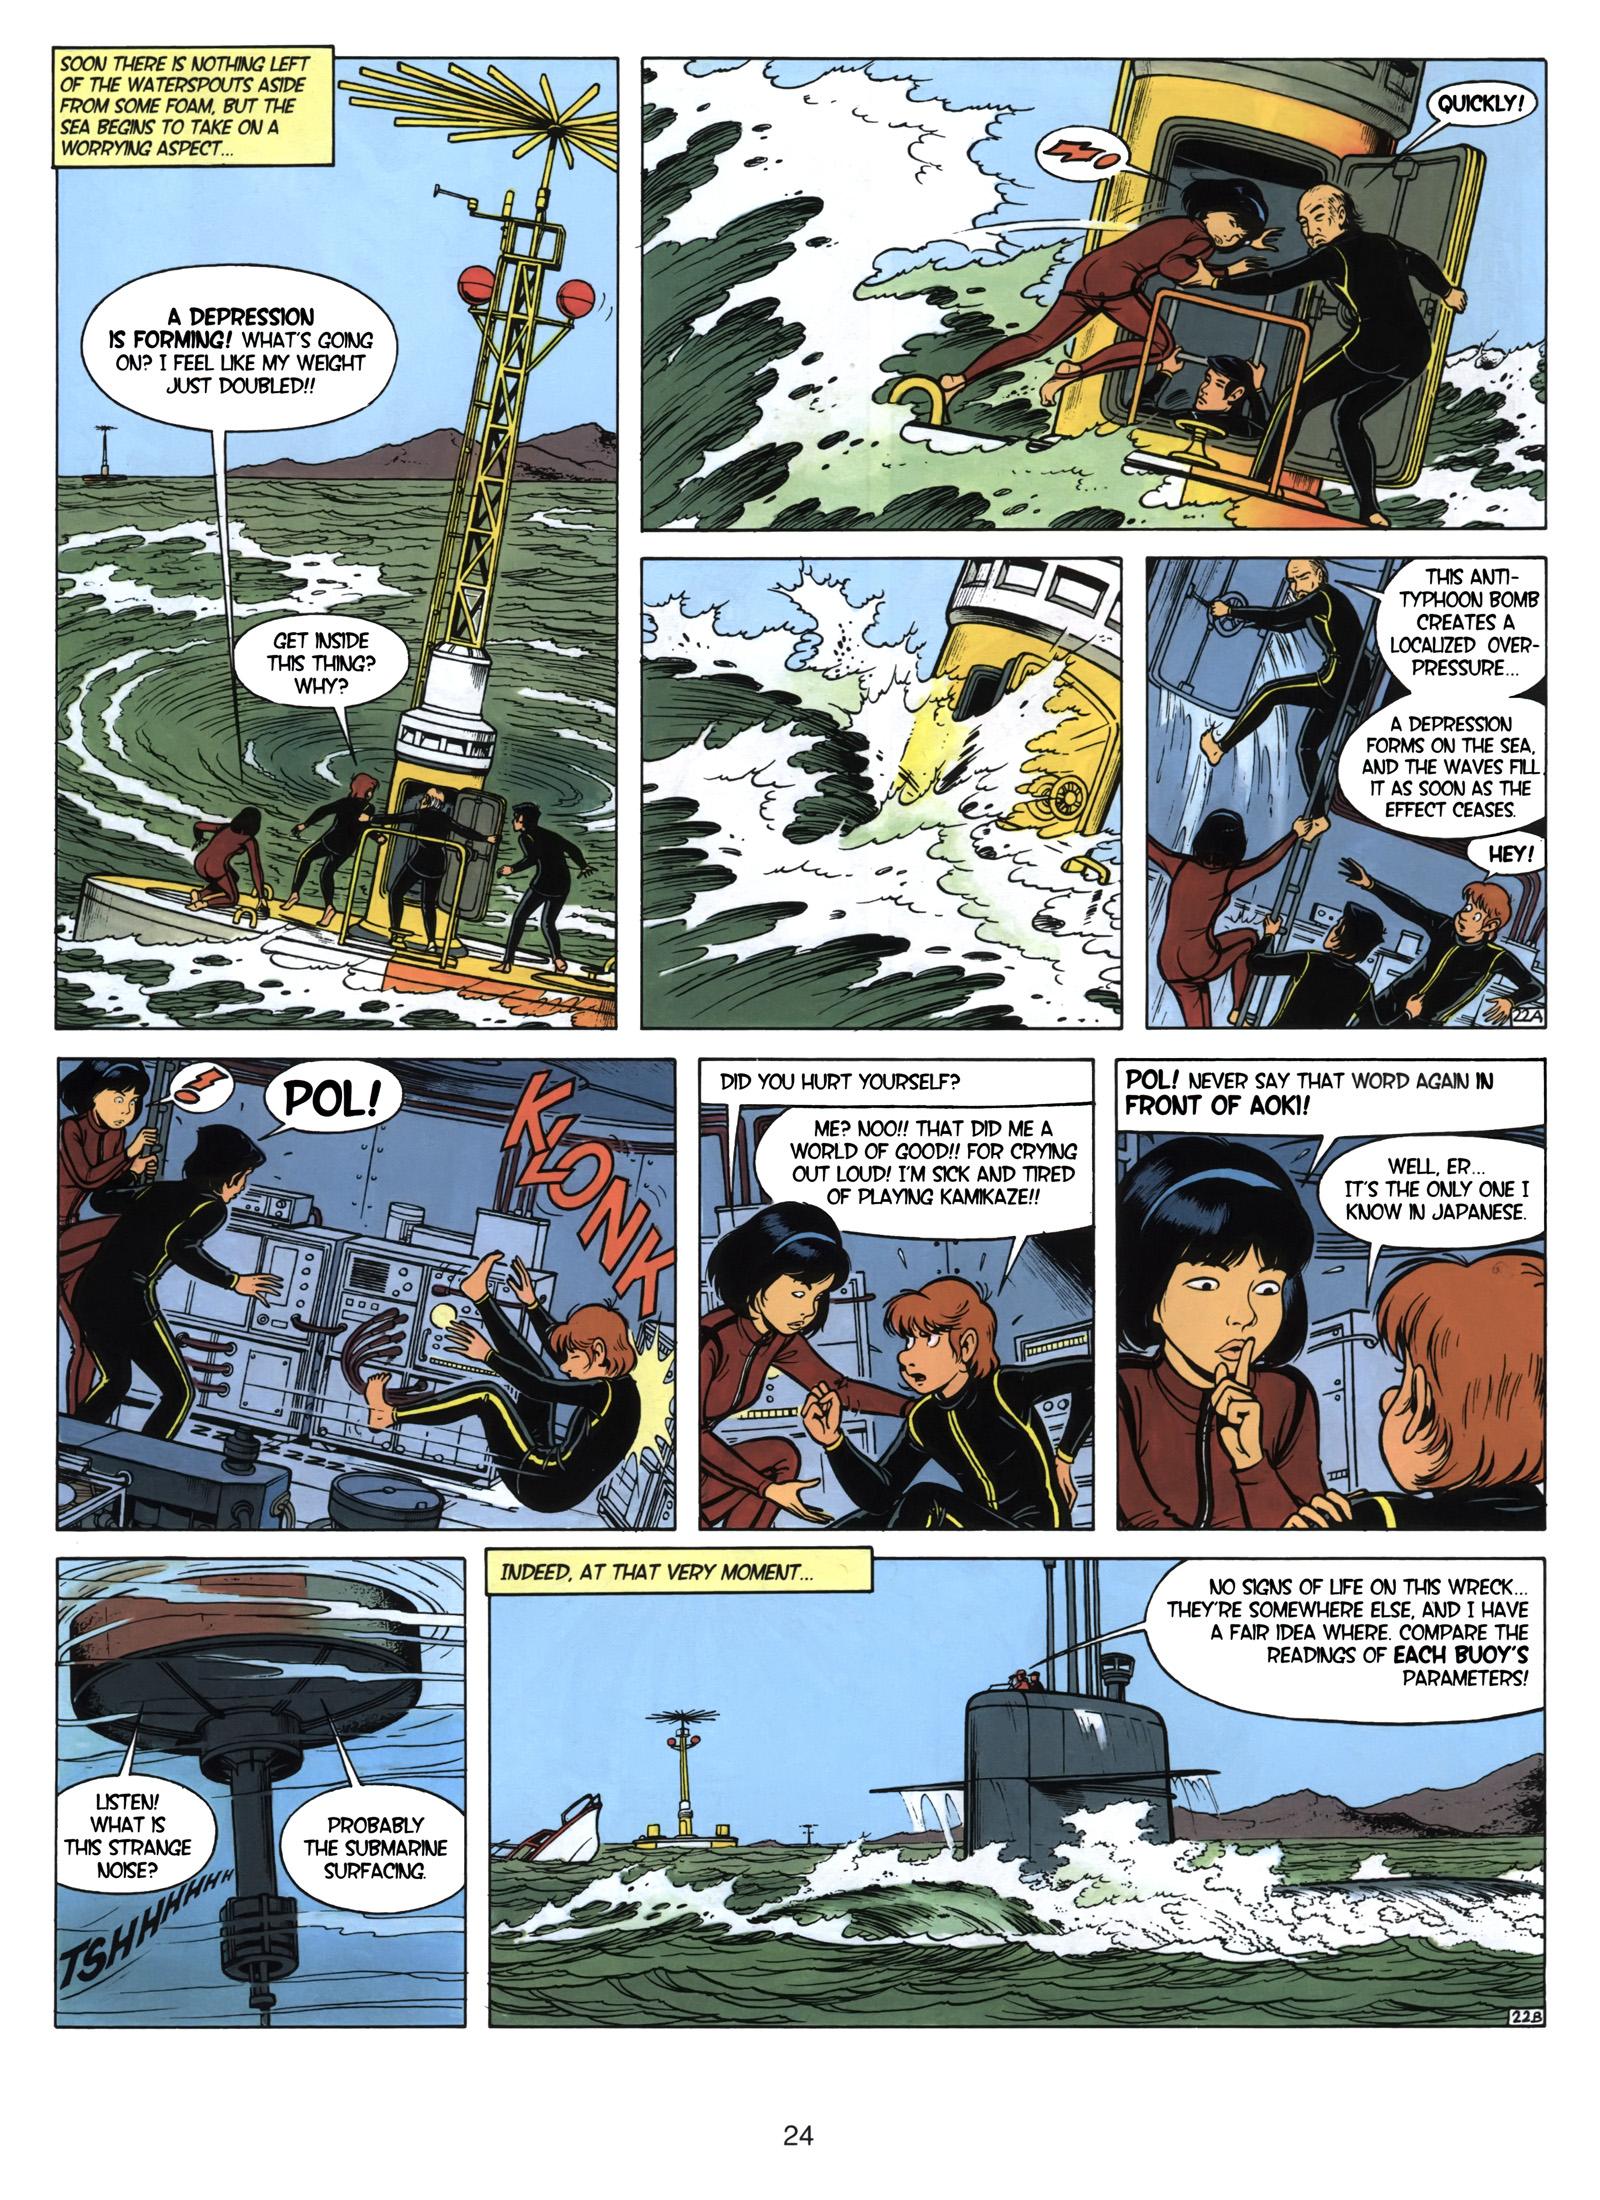 Yoko Tsuno Daughter of the Wind review